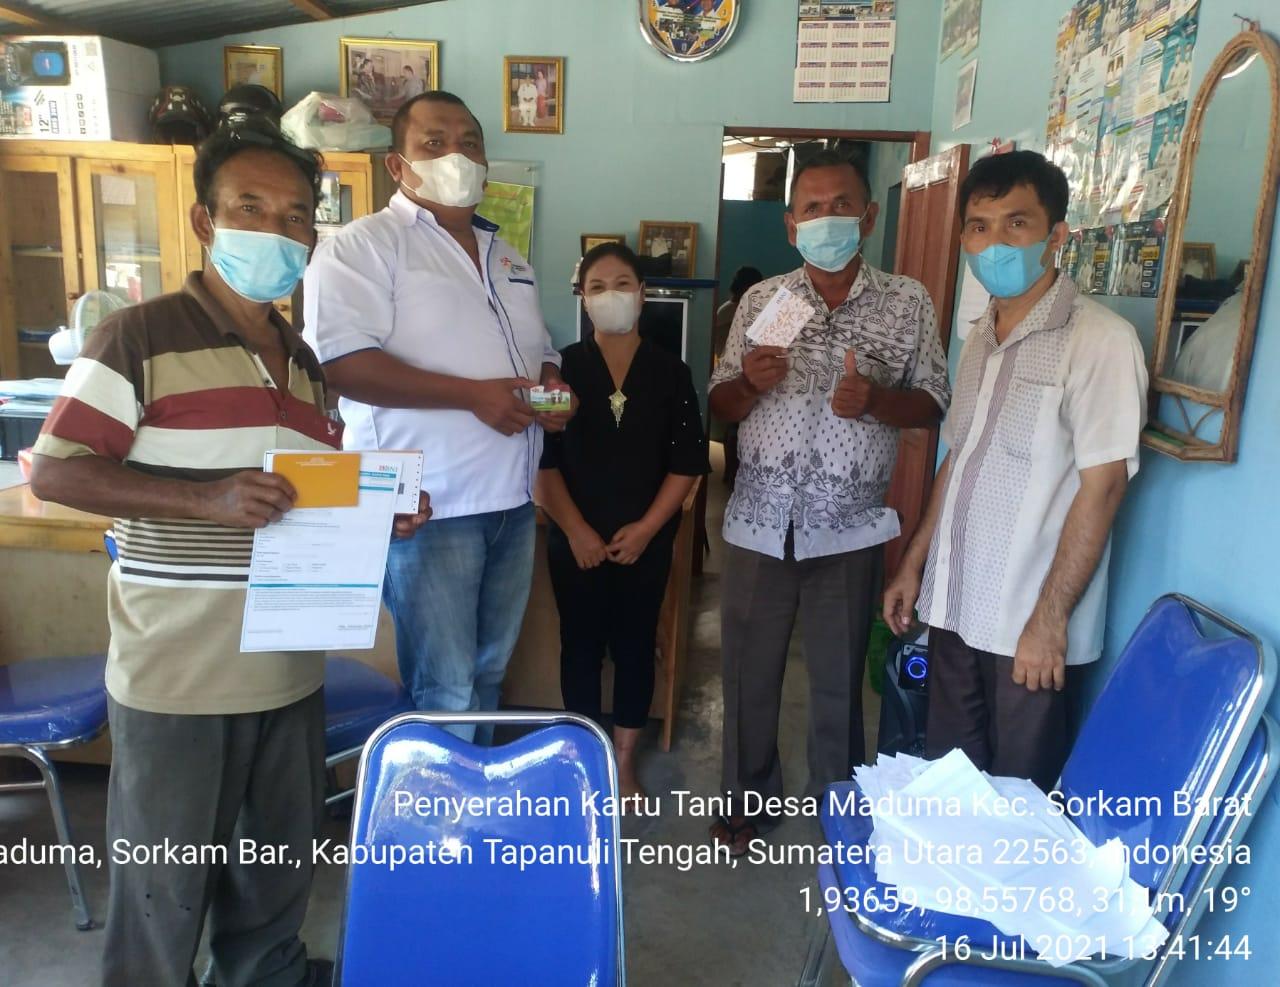 Parlindungan Nainggolan selaku Kepala Desa Aek Raso, Kecamatan Sorkam Barat saat membagikan kartu tani kepada masyarakat. Foto: istimewa